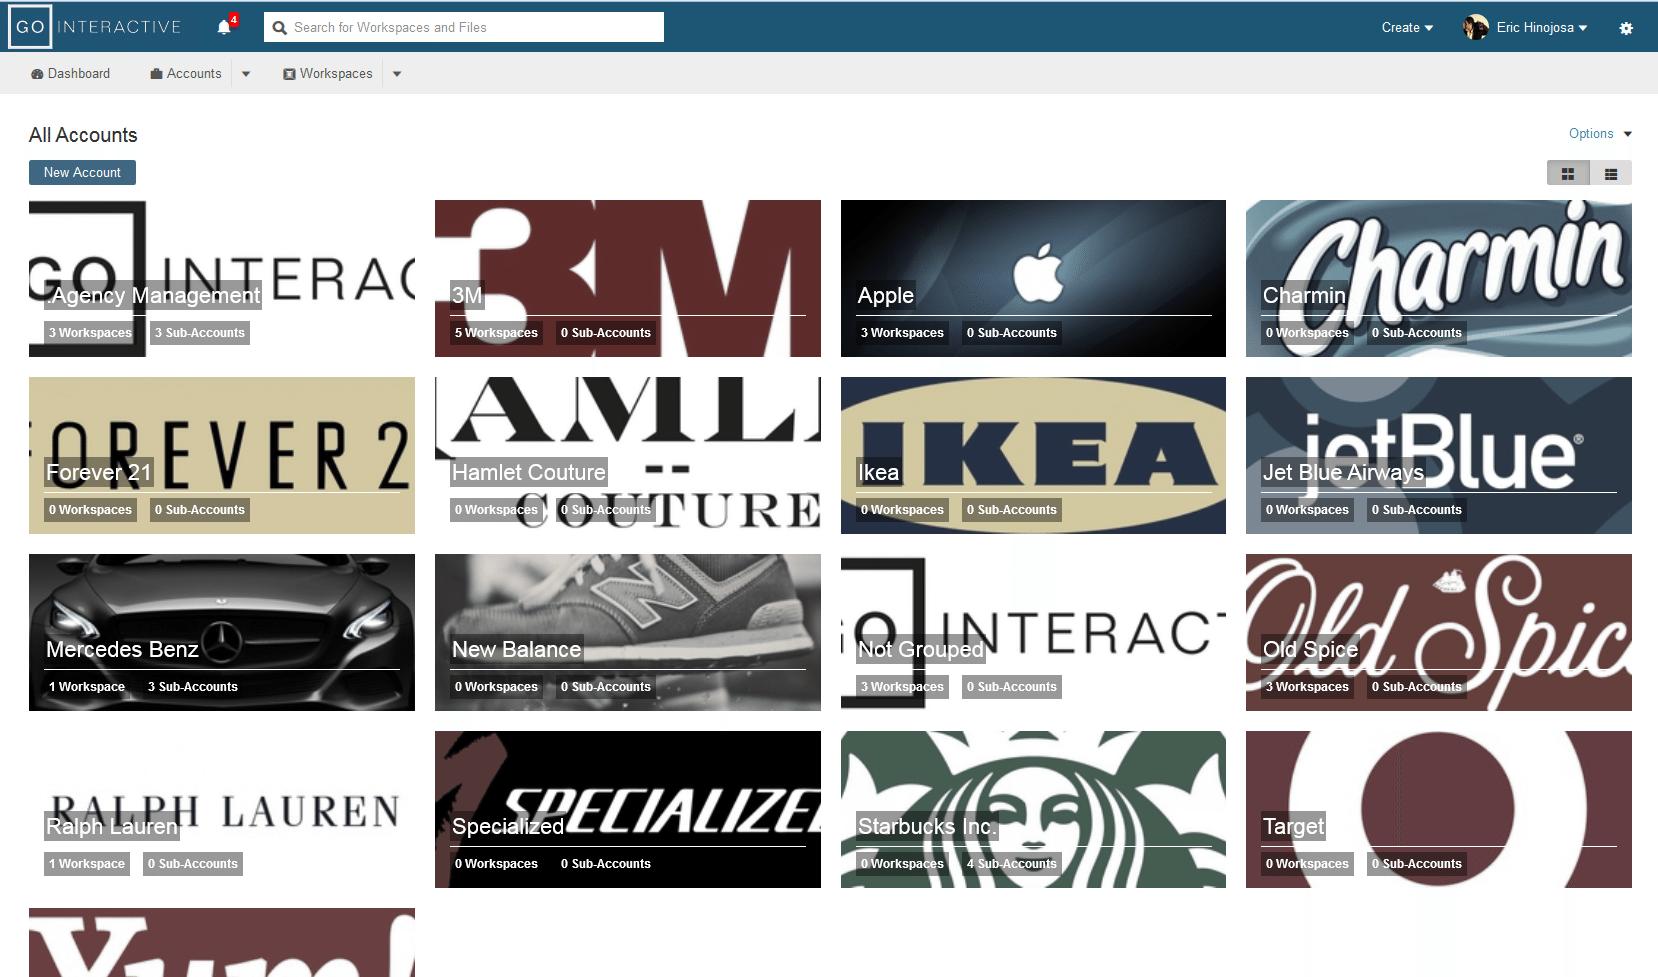 GlobalMeet Webcast screenshot: Account management and dashboards